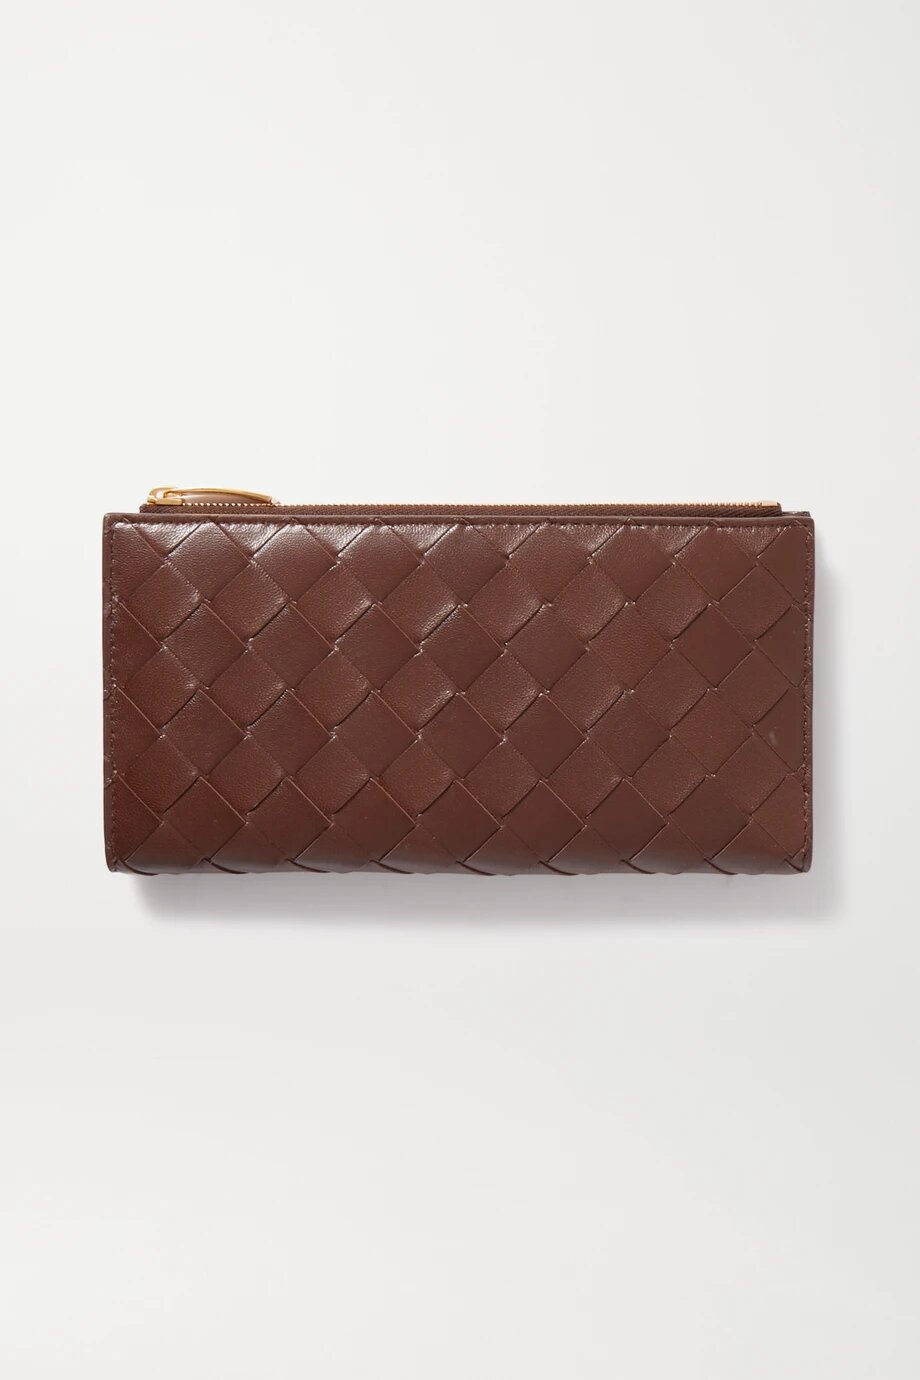 Bottega Veneta Intrecciato leather continental wallet 1211лв